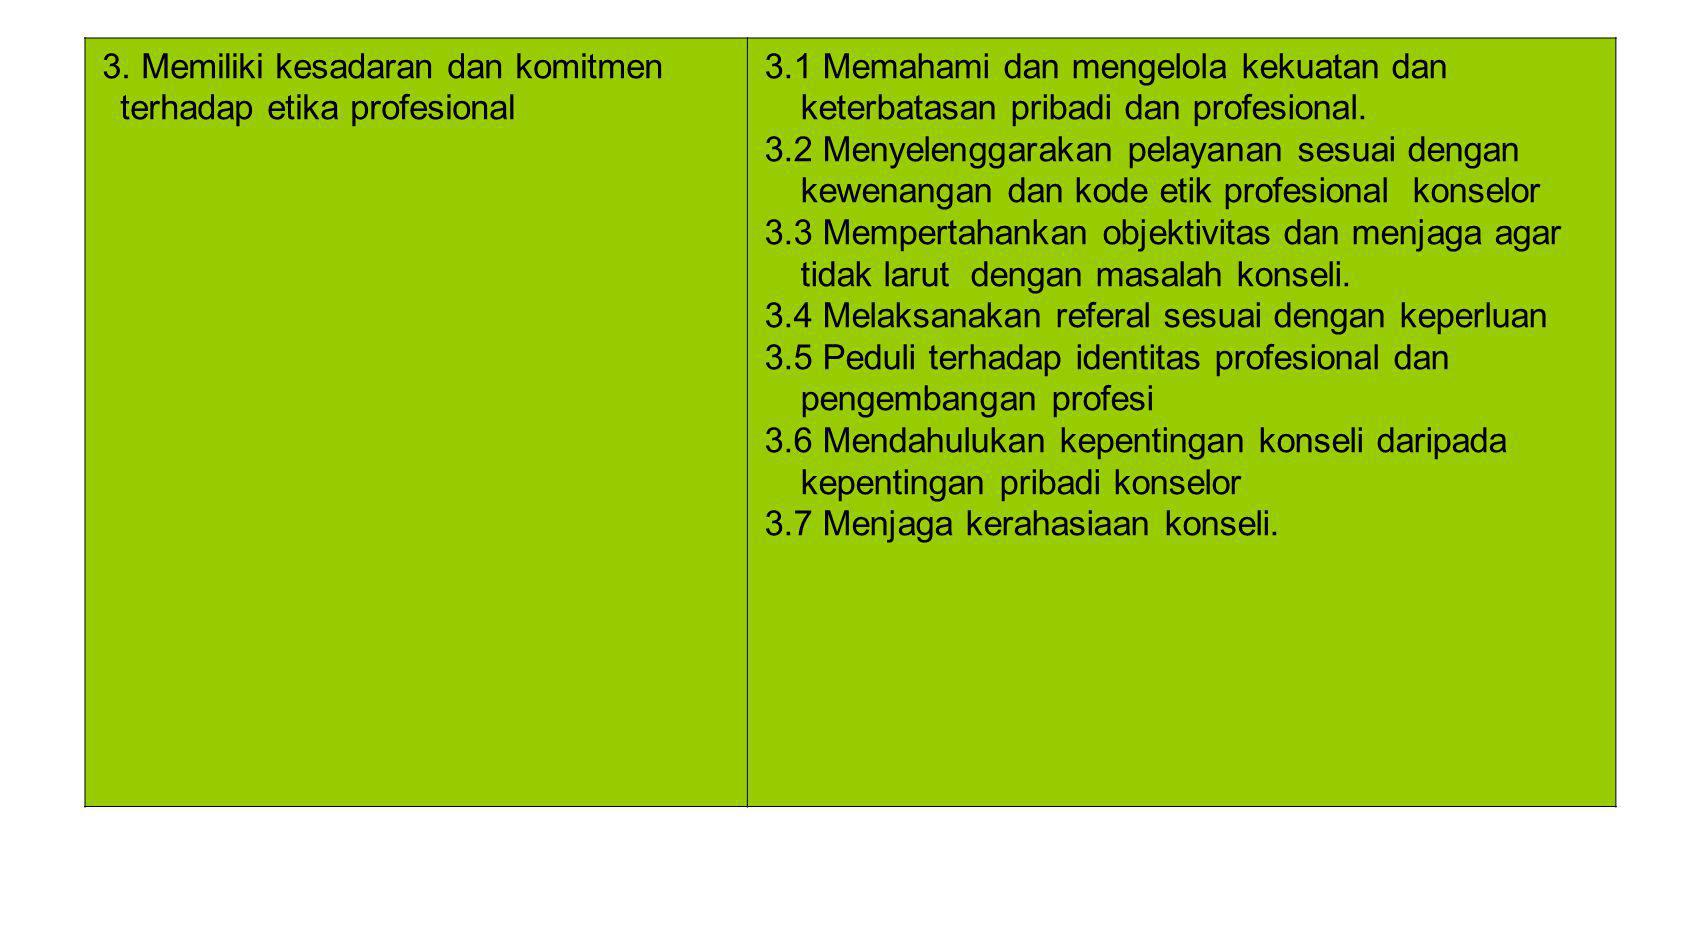 3. Memiliki kesadaran dan komitmen terhadap etika profesional